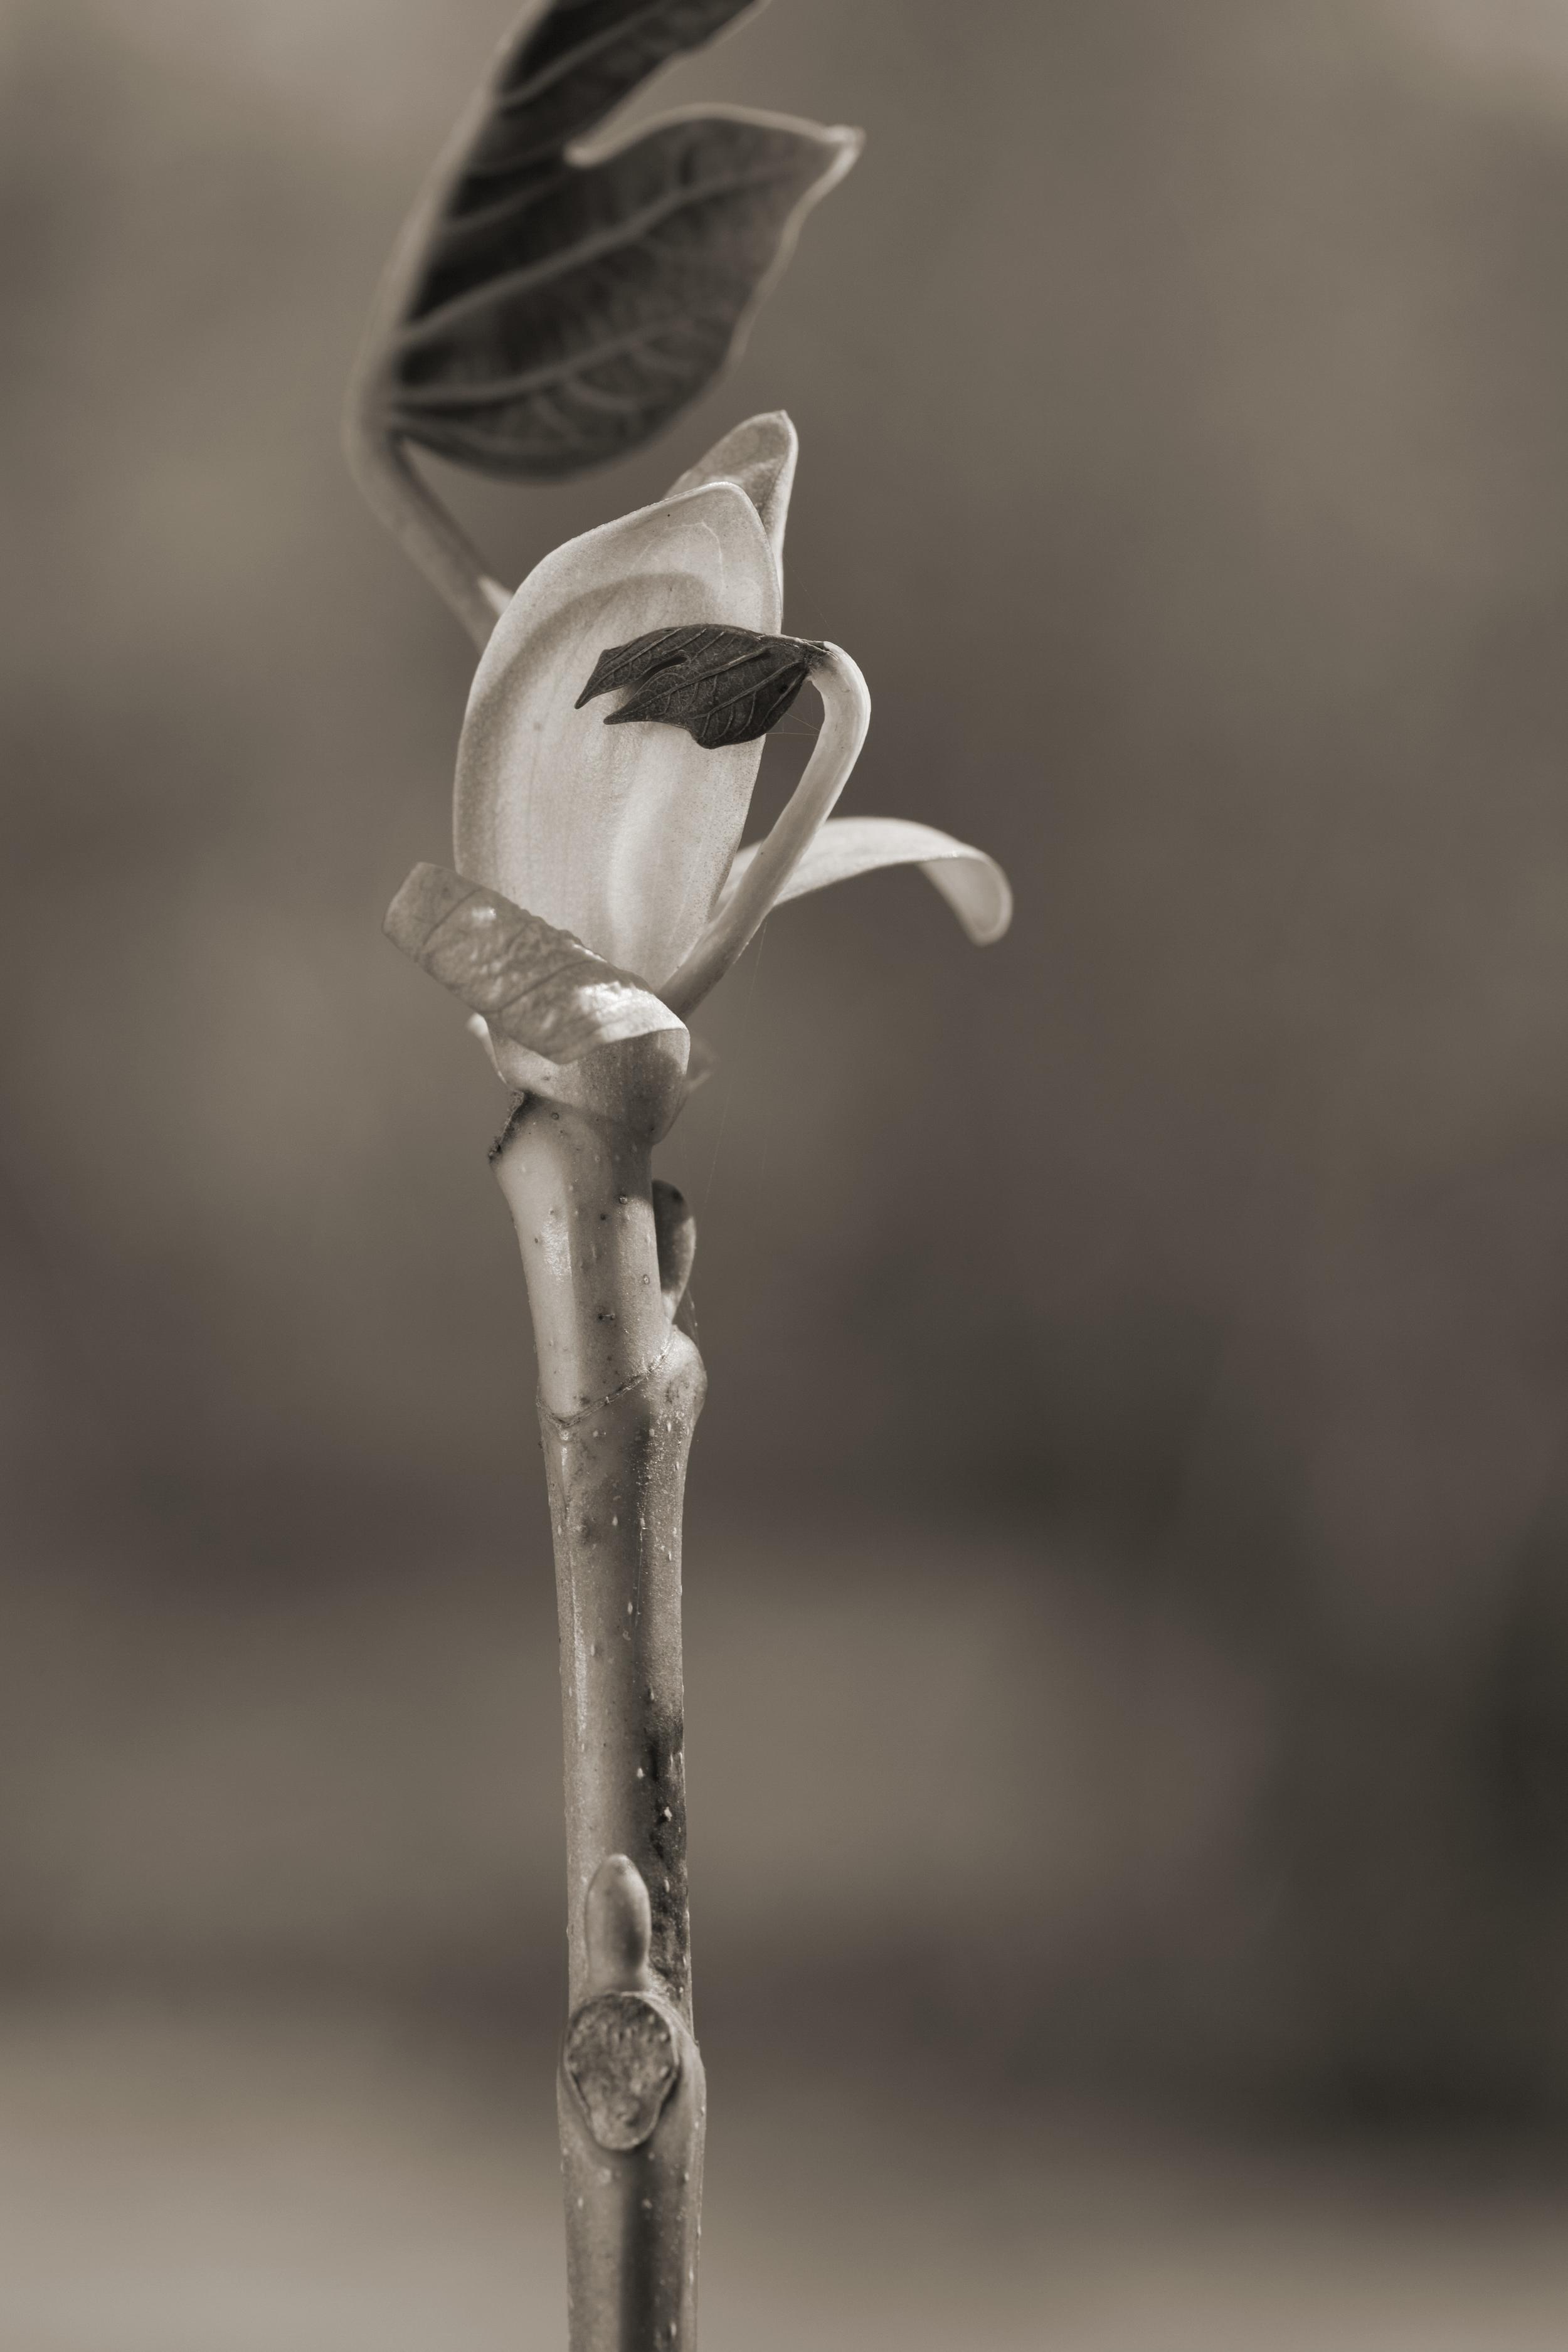 Tulip Poplar #2